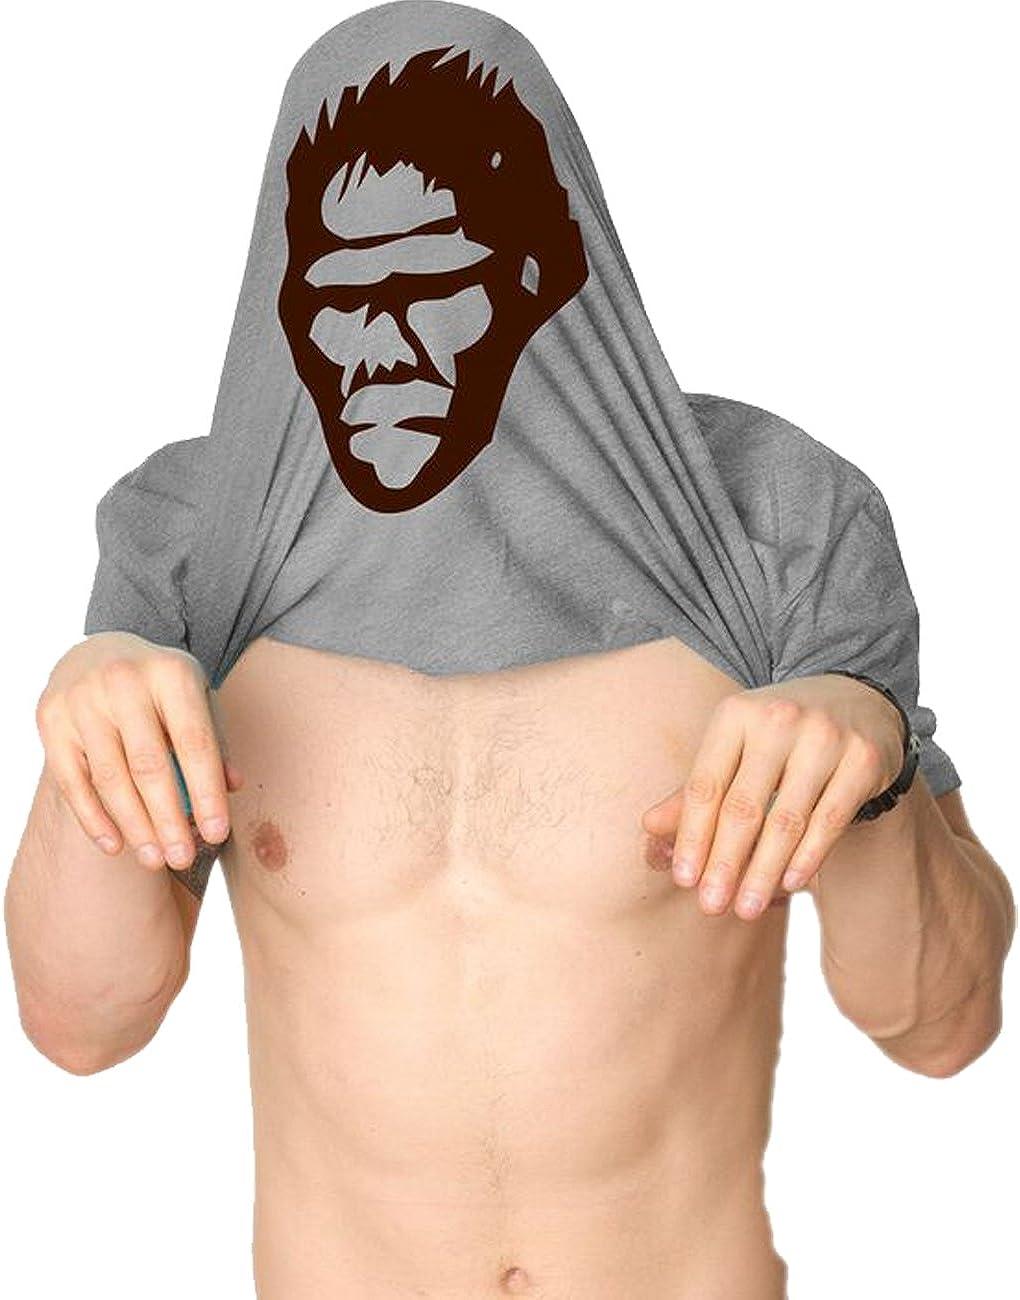 Ask Me About My Bigfoot T Shirt Funny Graphic Sasquatch Flip Shirts Yeti Humor